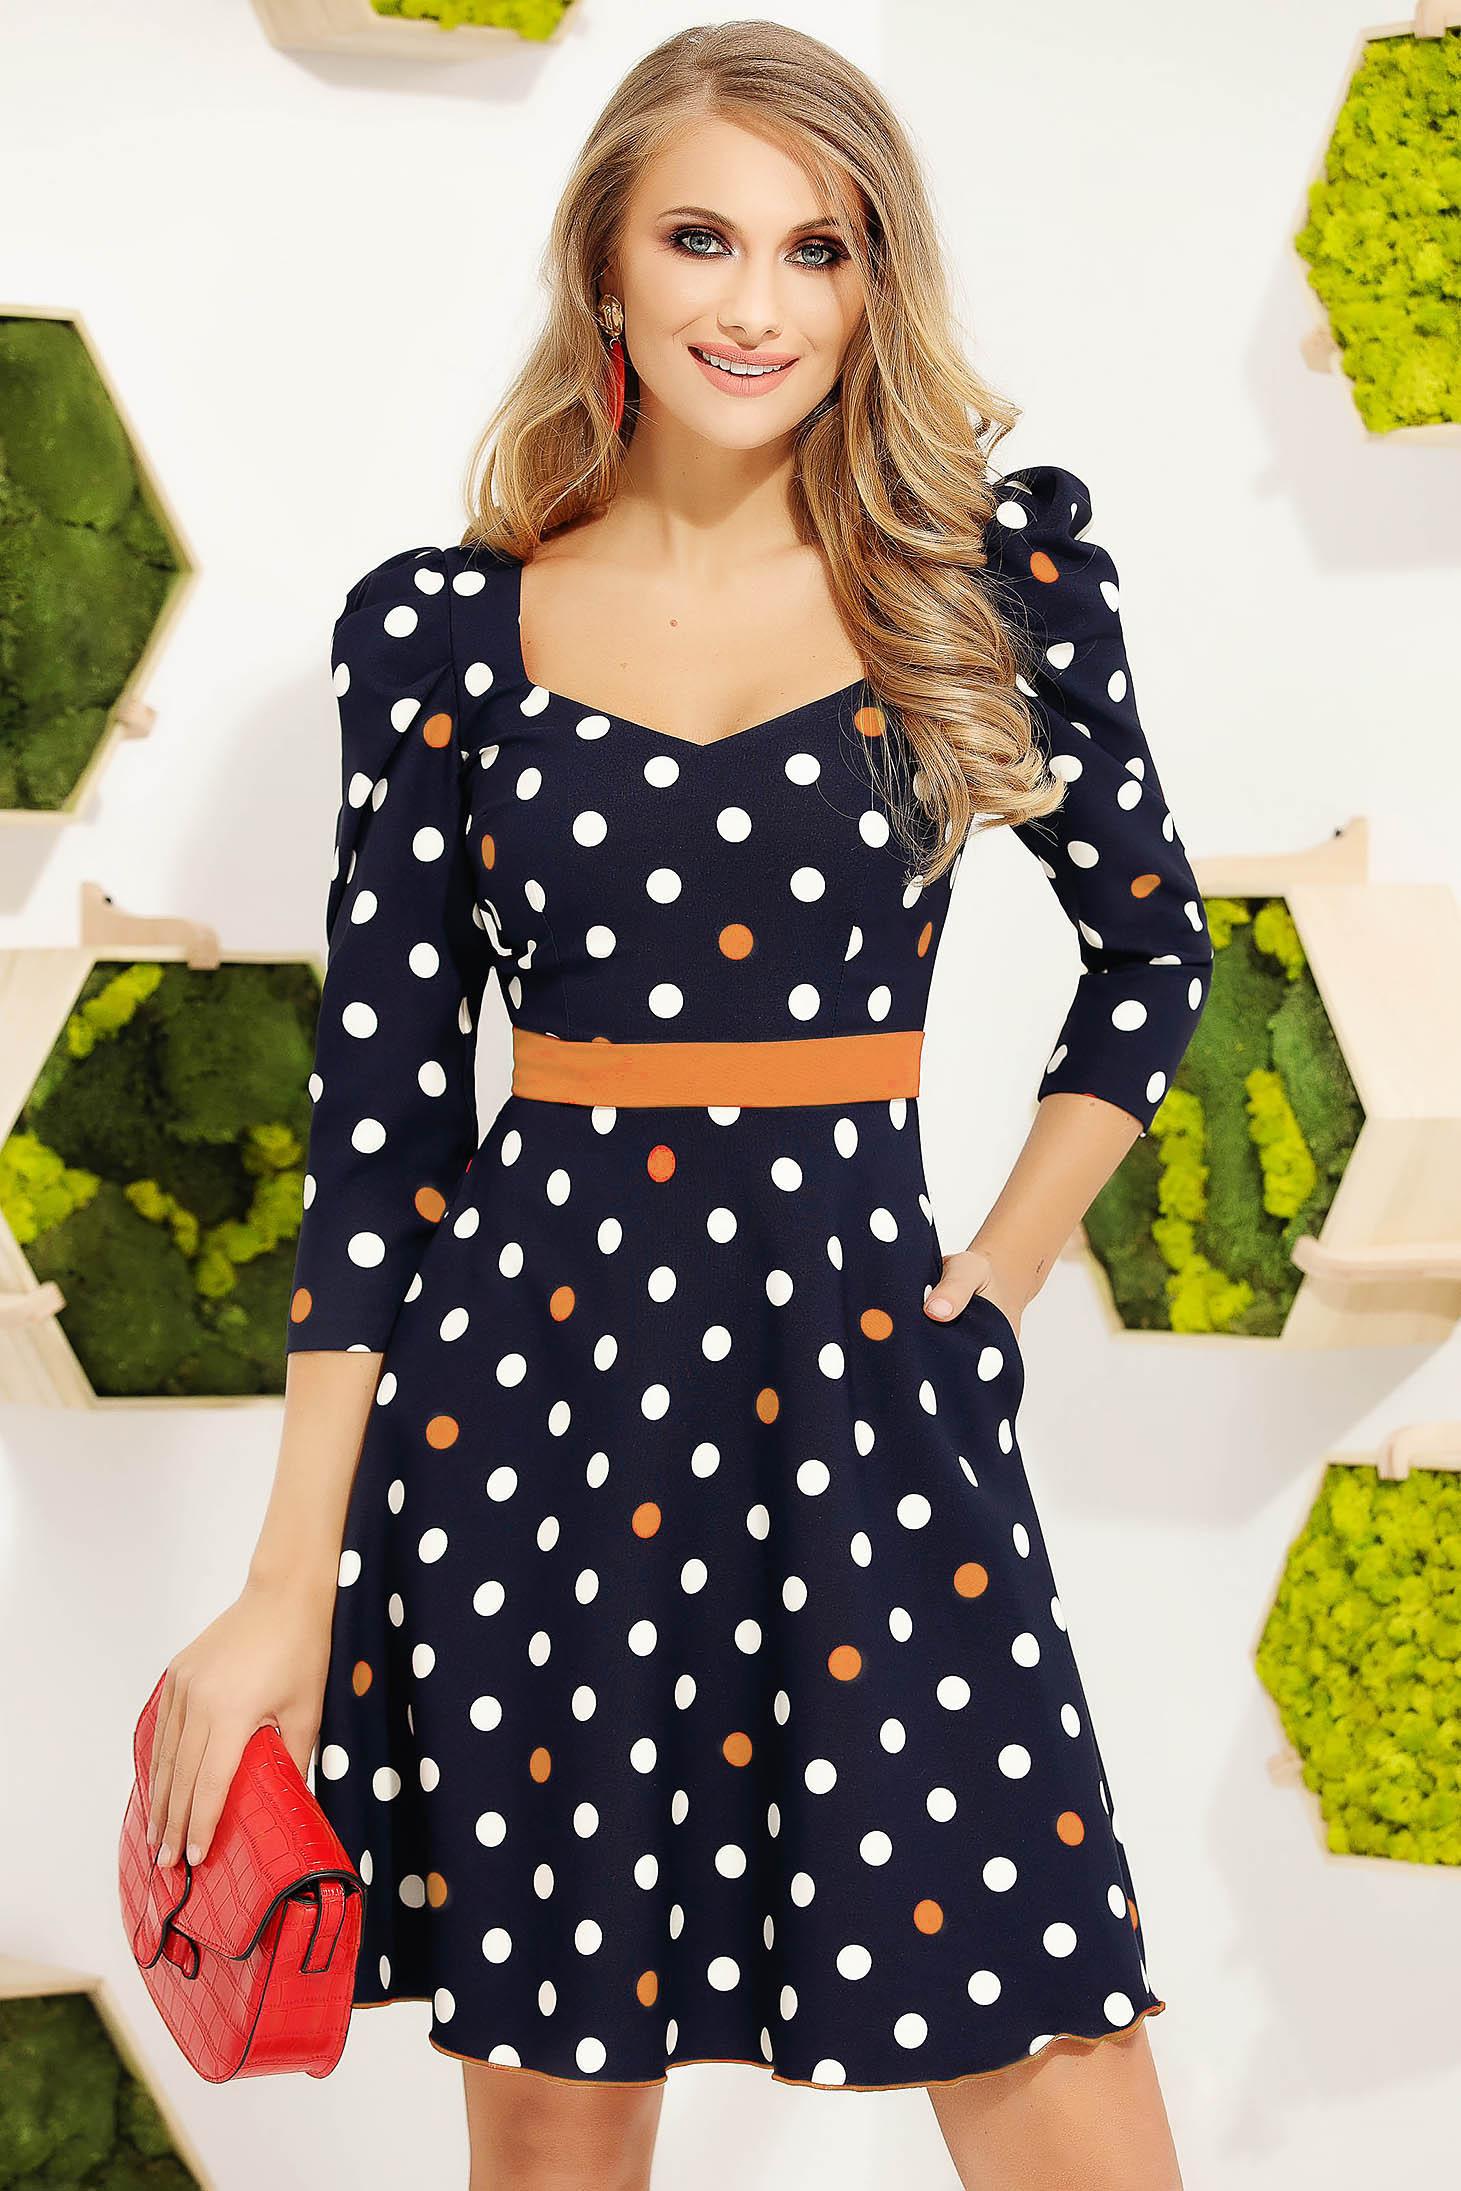 Mustard dress elegant short cut cloche accessorized with belt high shoulders